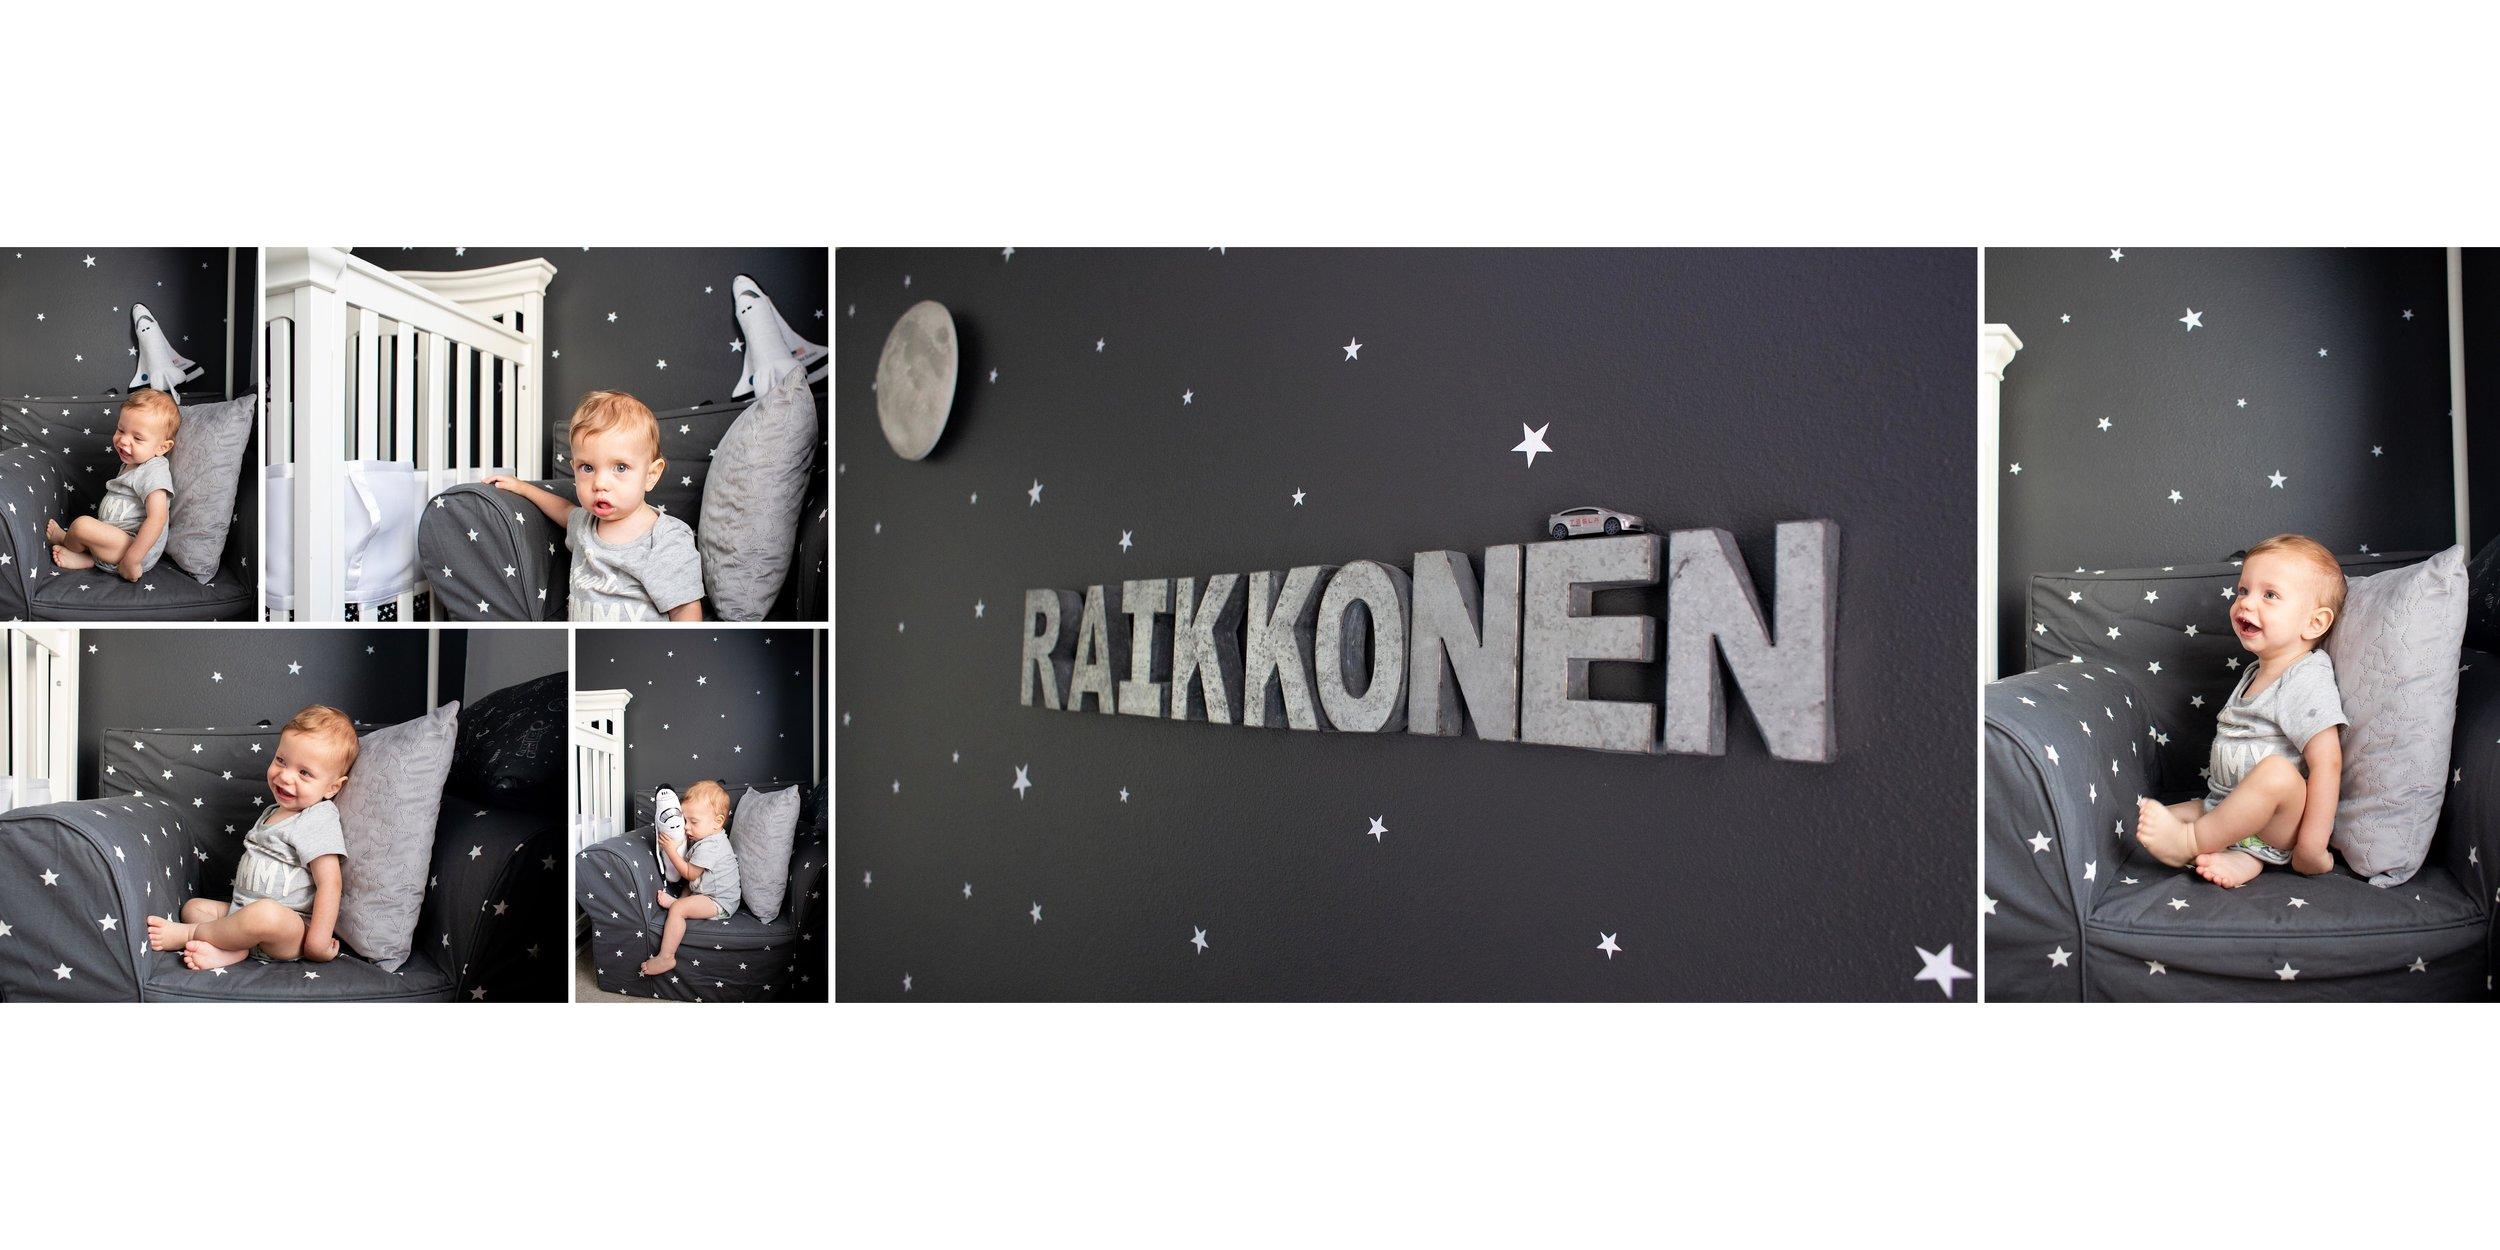 Raikkonen's_room_06.jpg